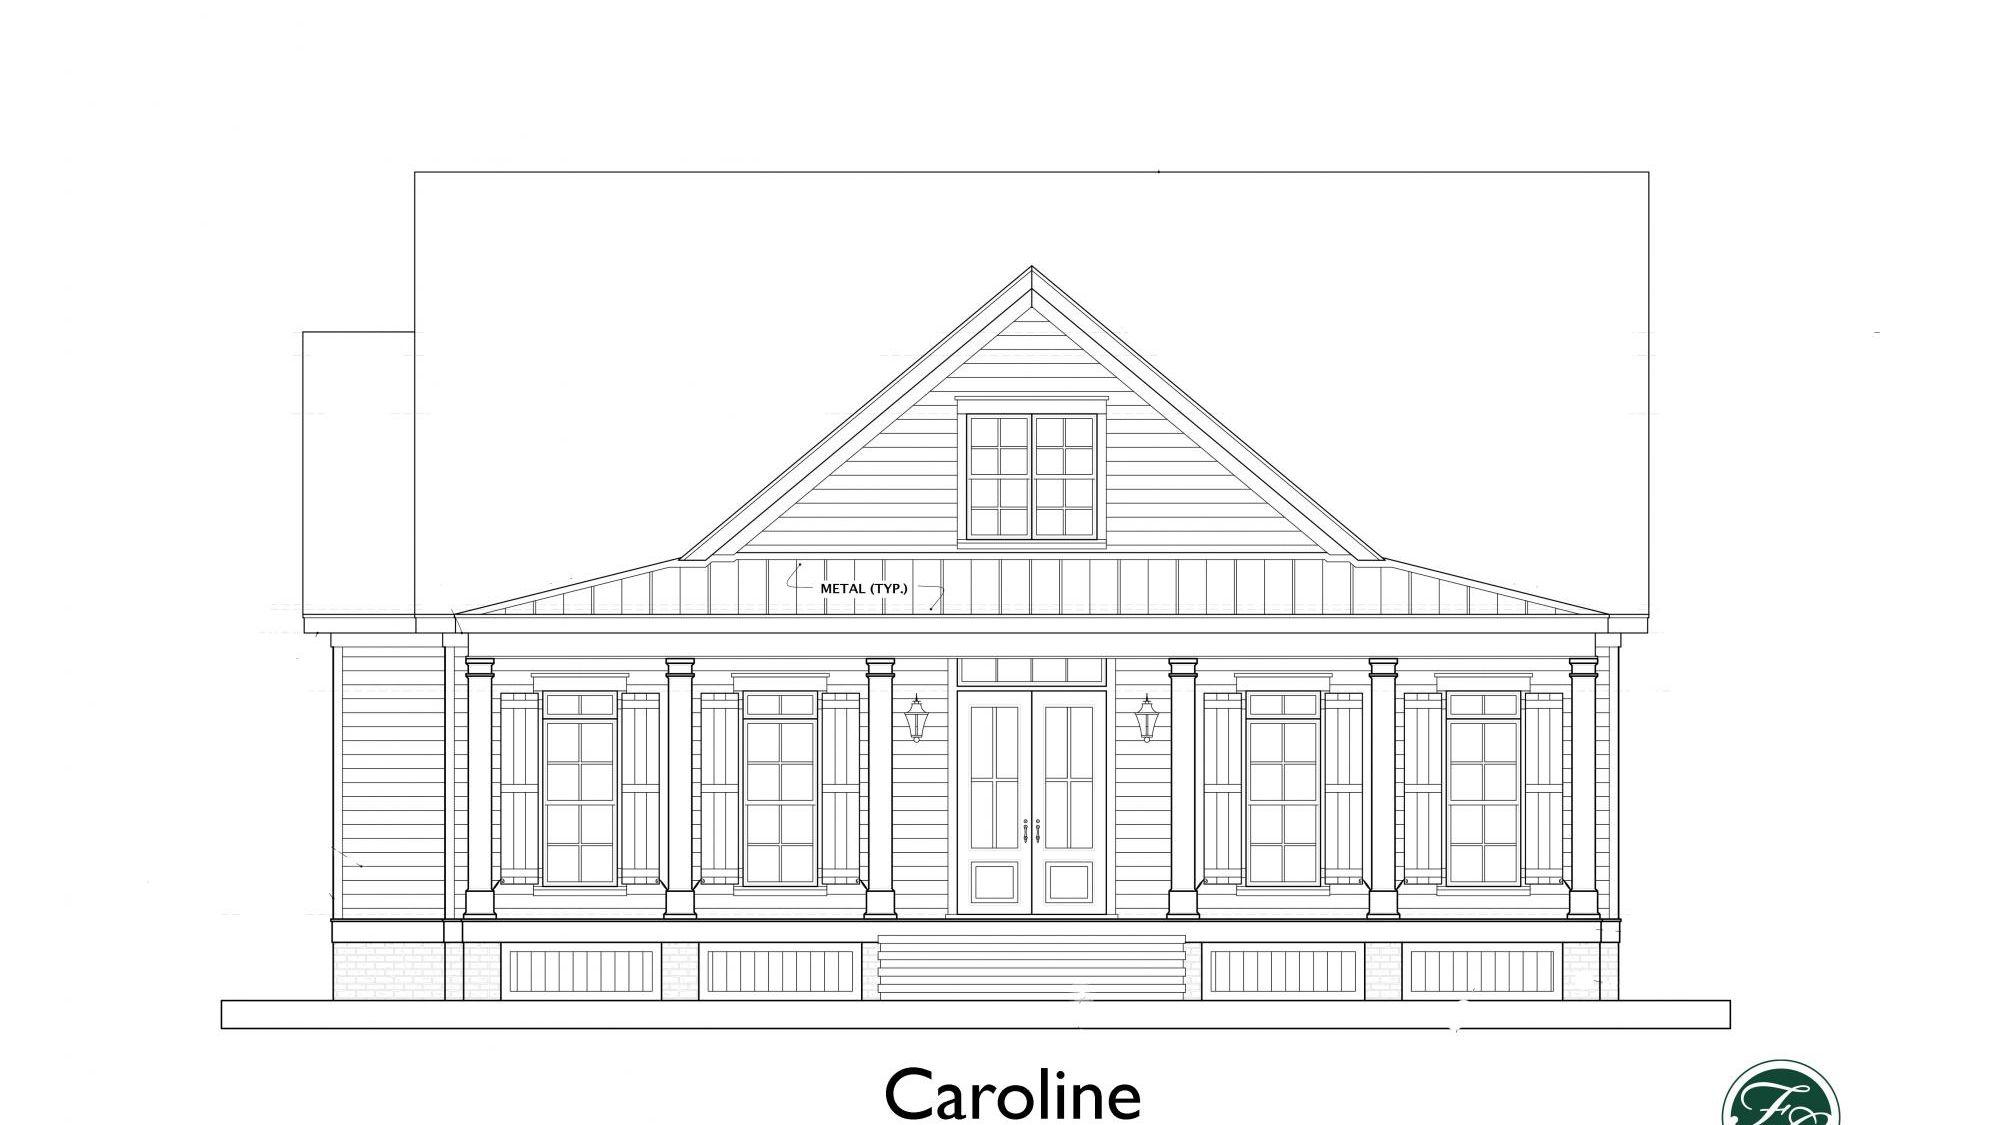 Caroline 3300 FE